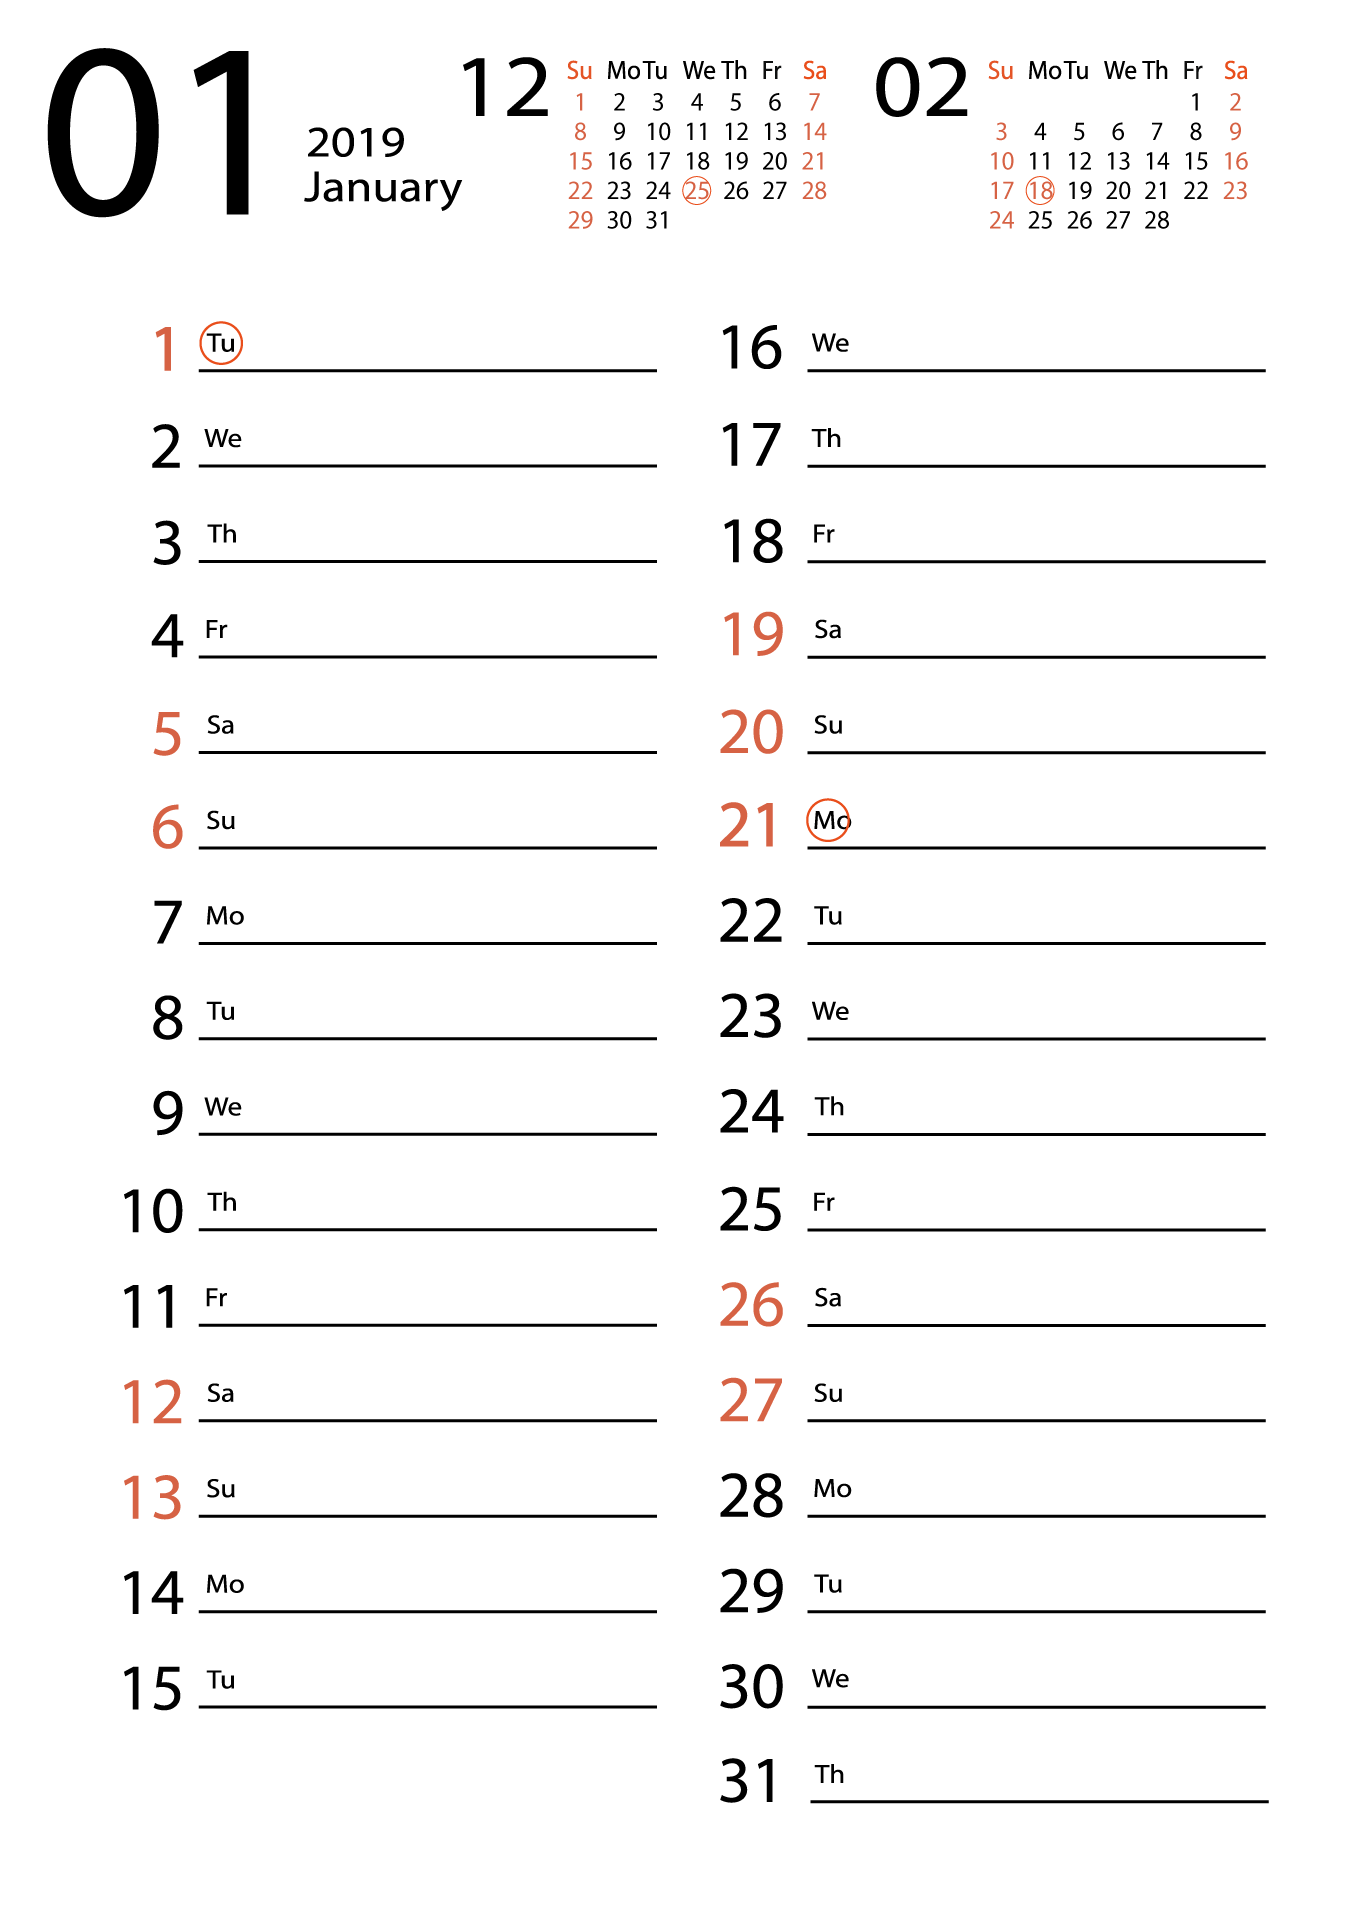 January 2019 calendar for notes